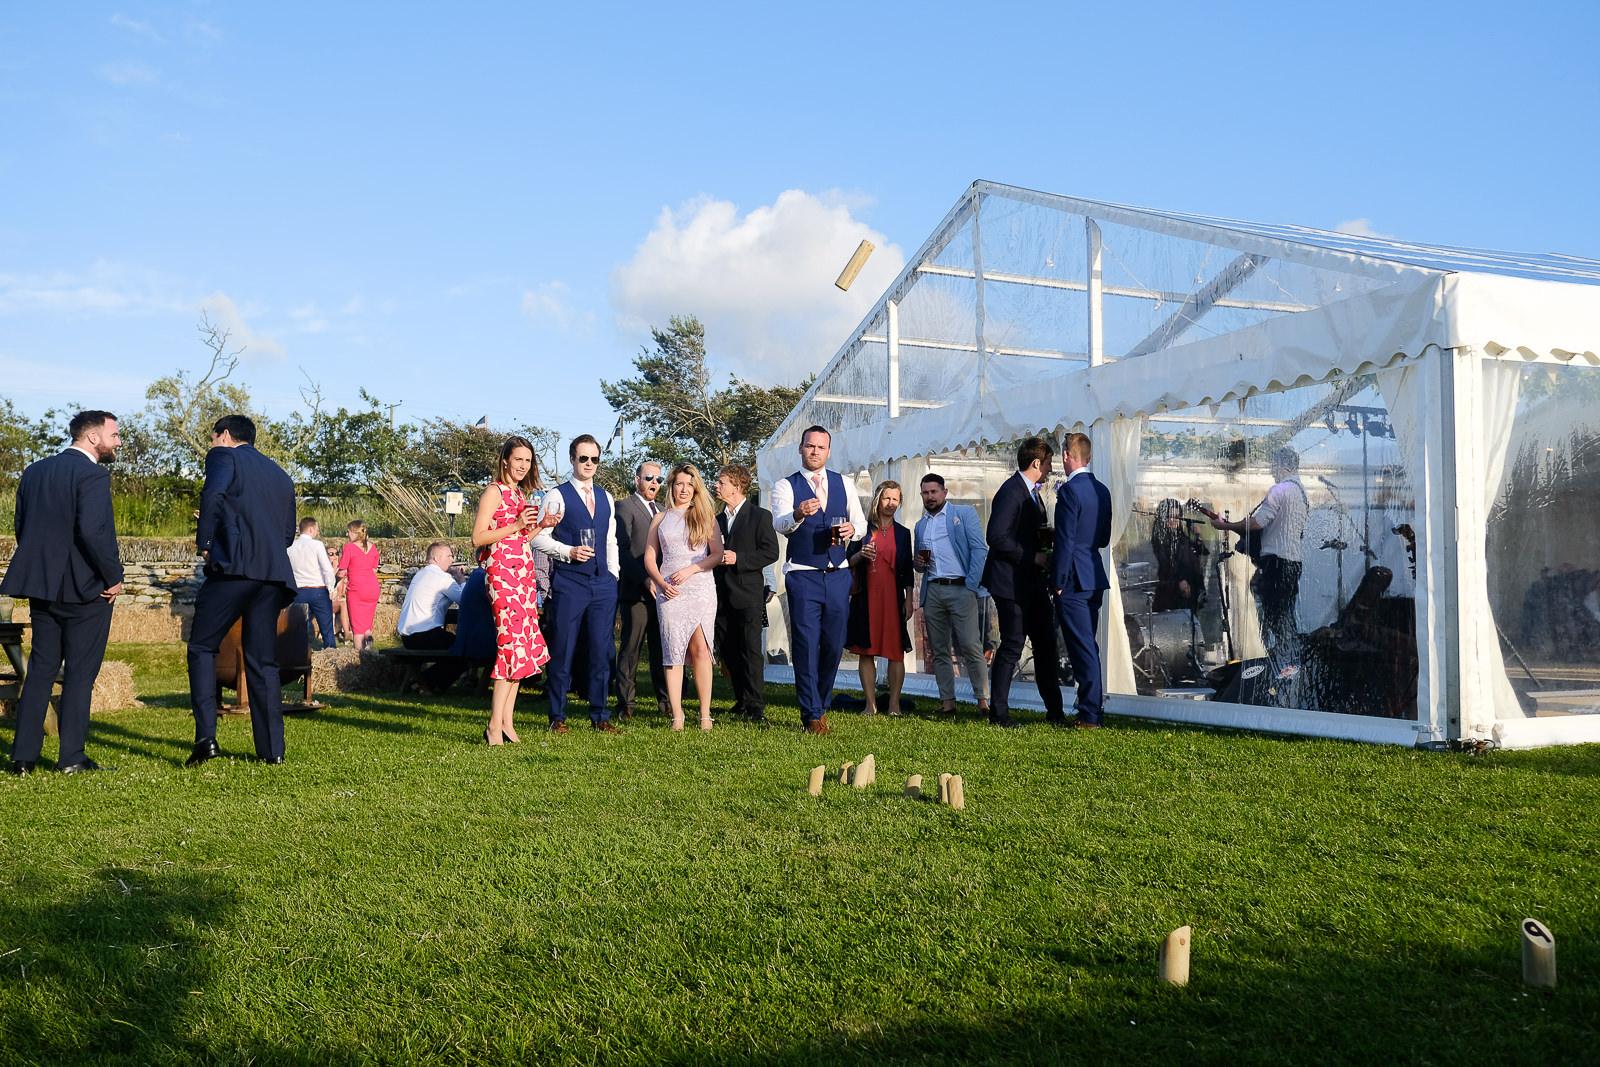 Roscarrock Farm wedding in Cornwall 075.jpg